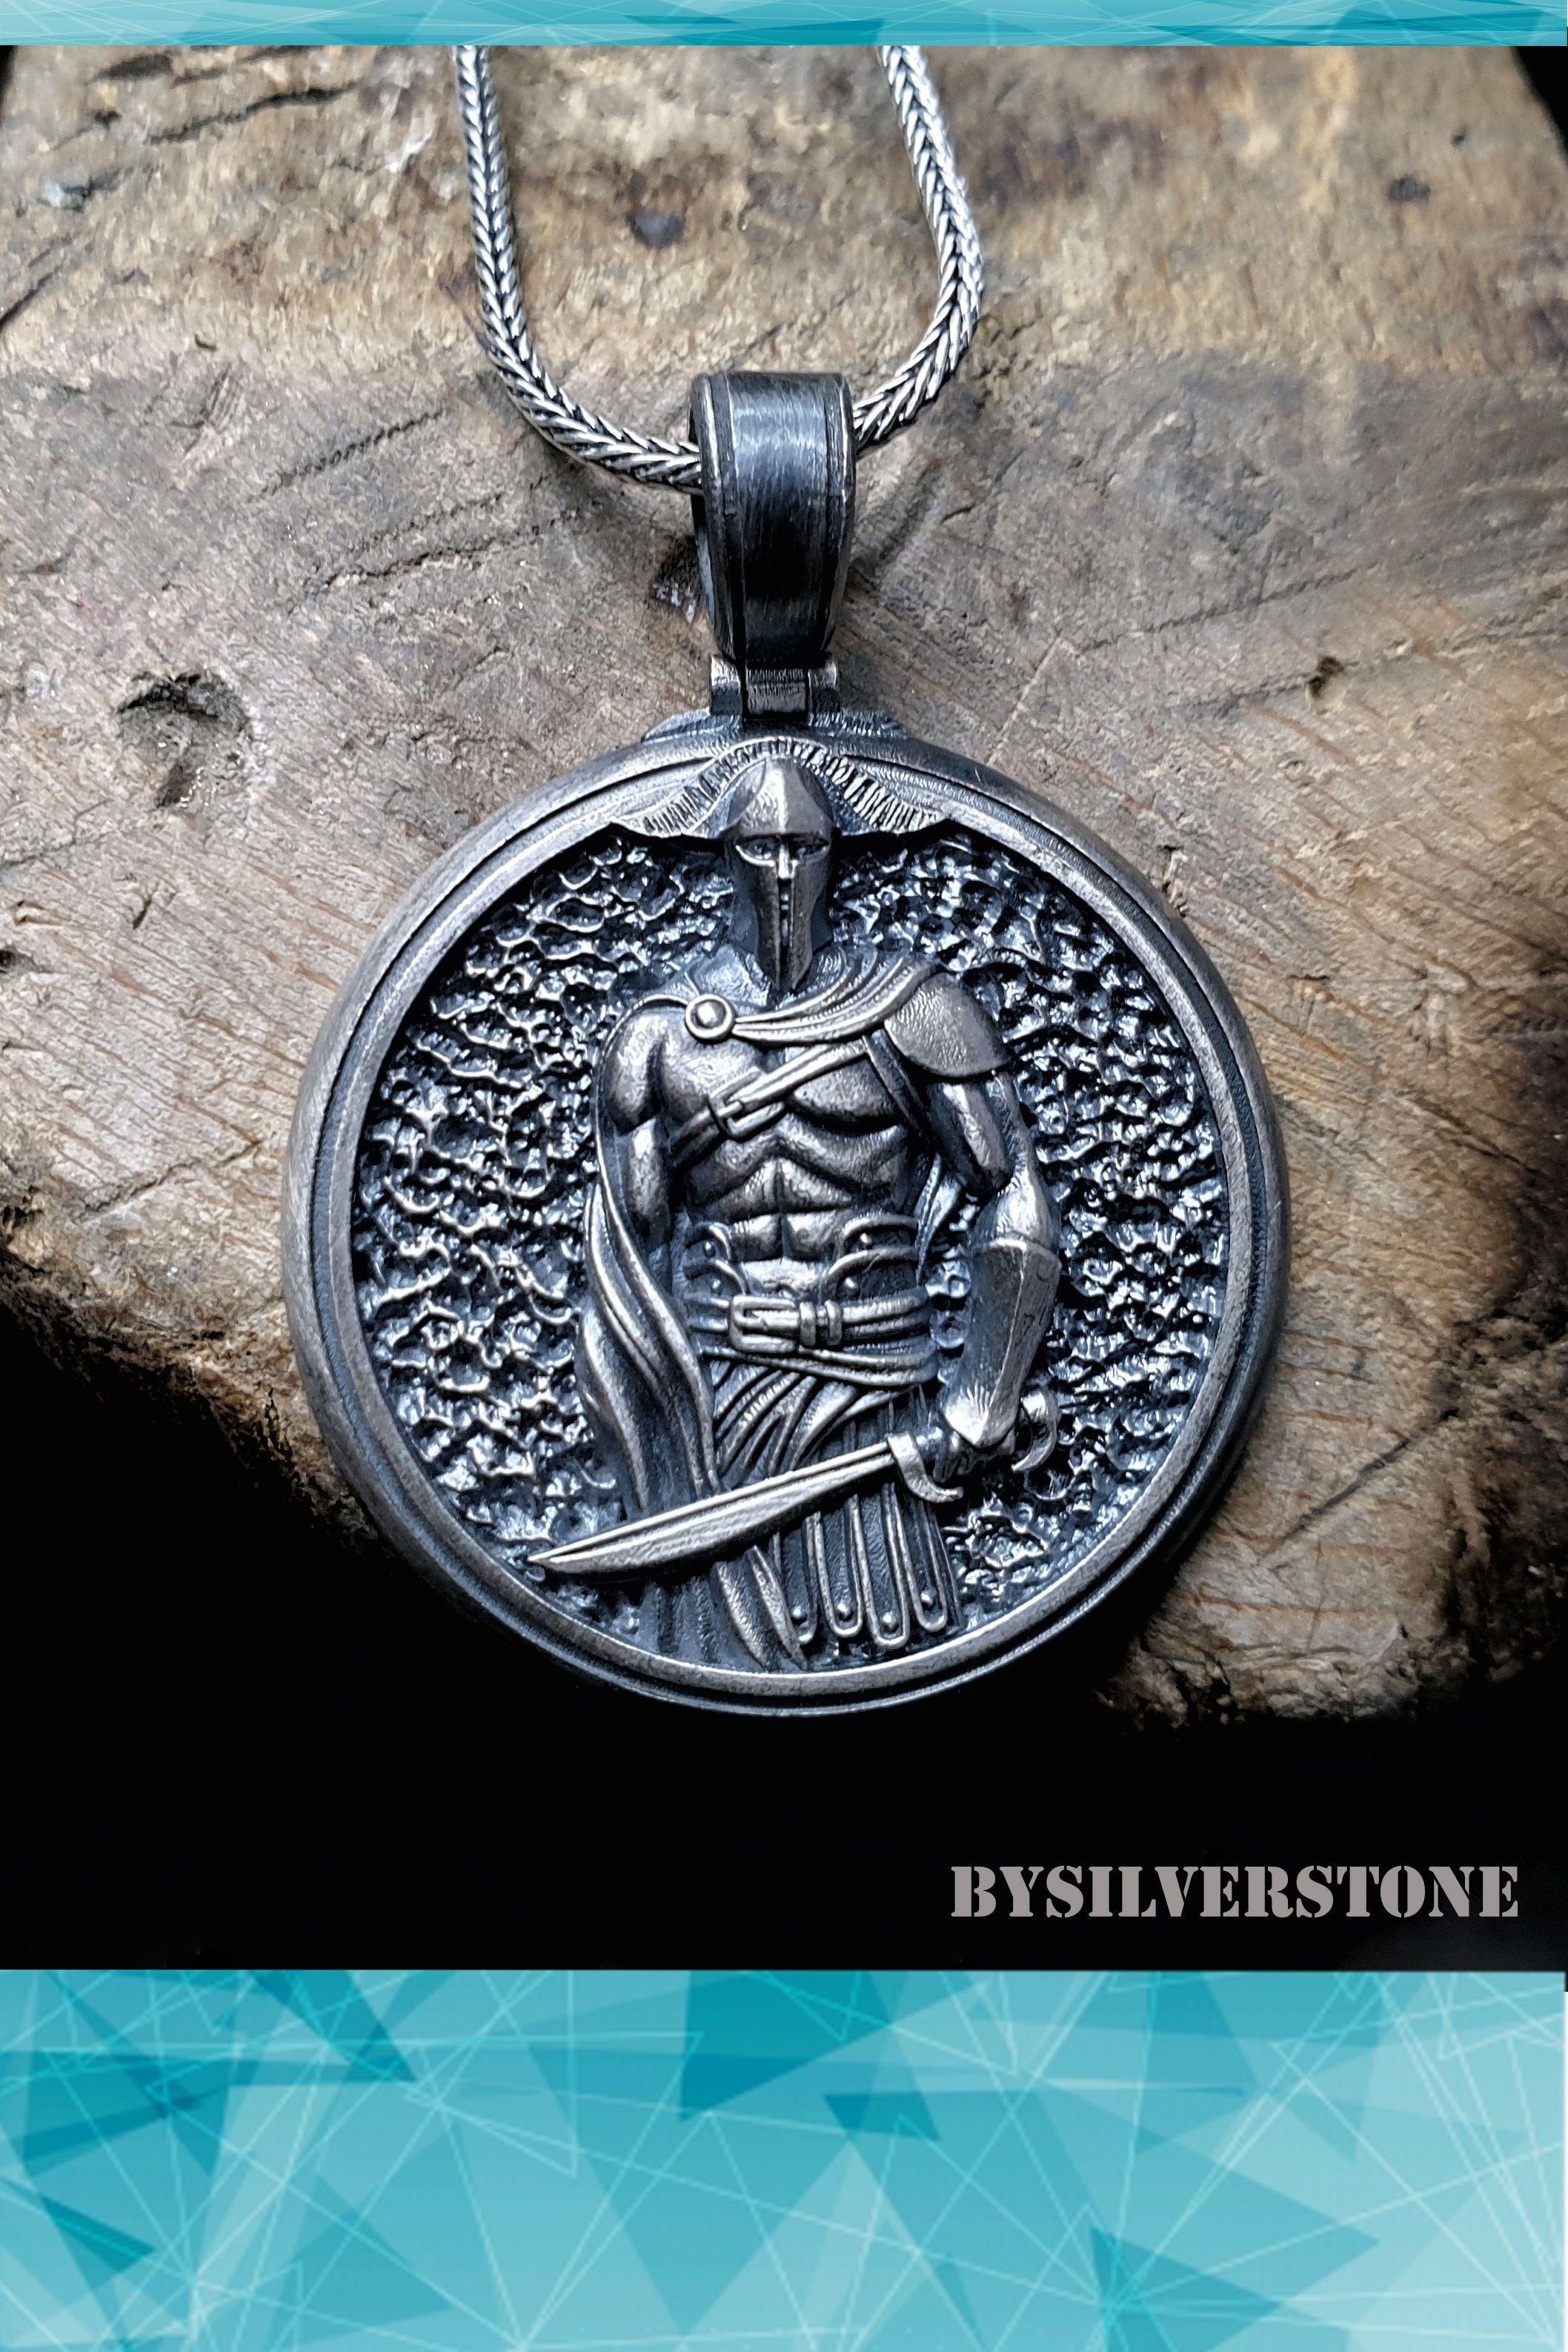 Pandora Mens Necklace : pandora, necklace, Soldier, Silver, Medallion, Necklace,, Men's, Unique, Accessories., Warrior, Pendants,, Jewelry